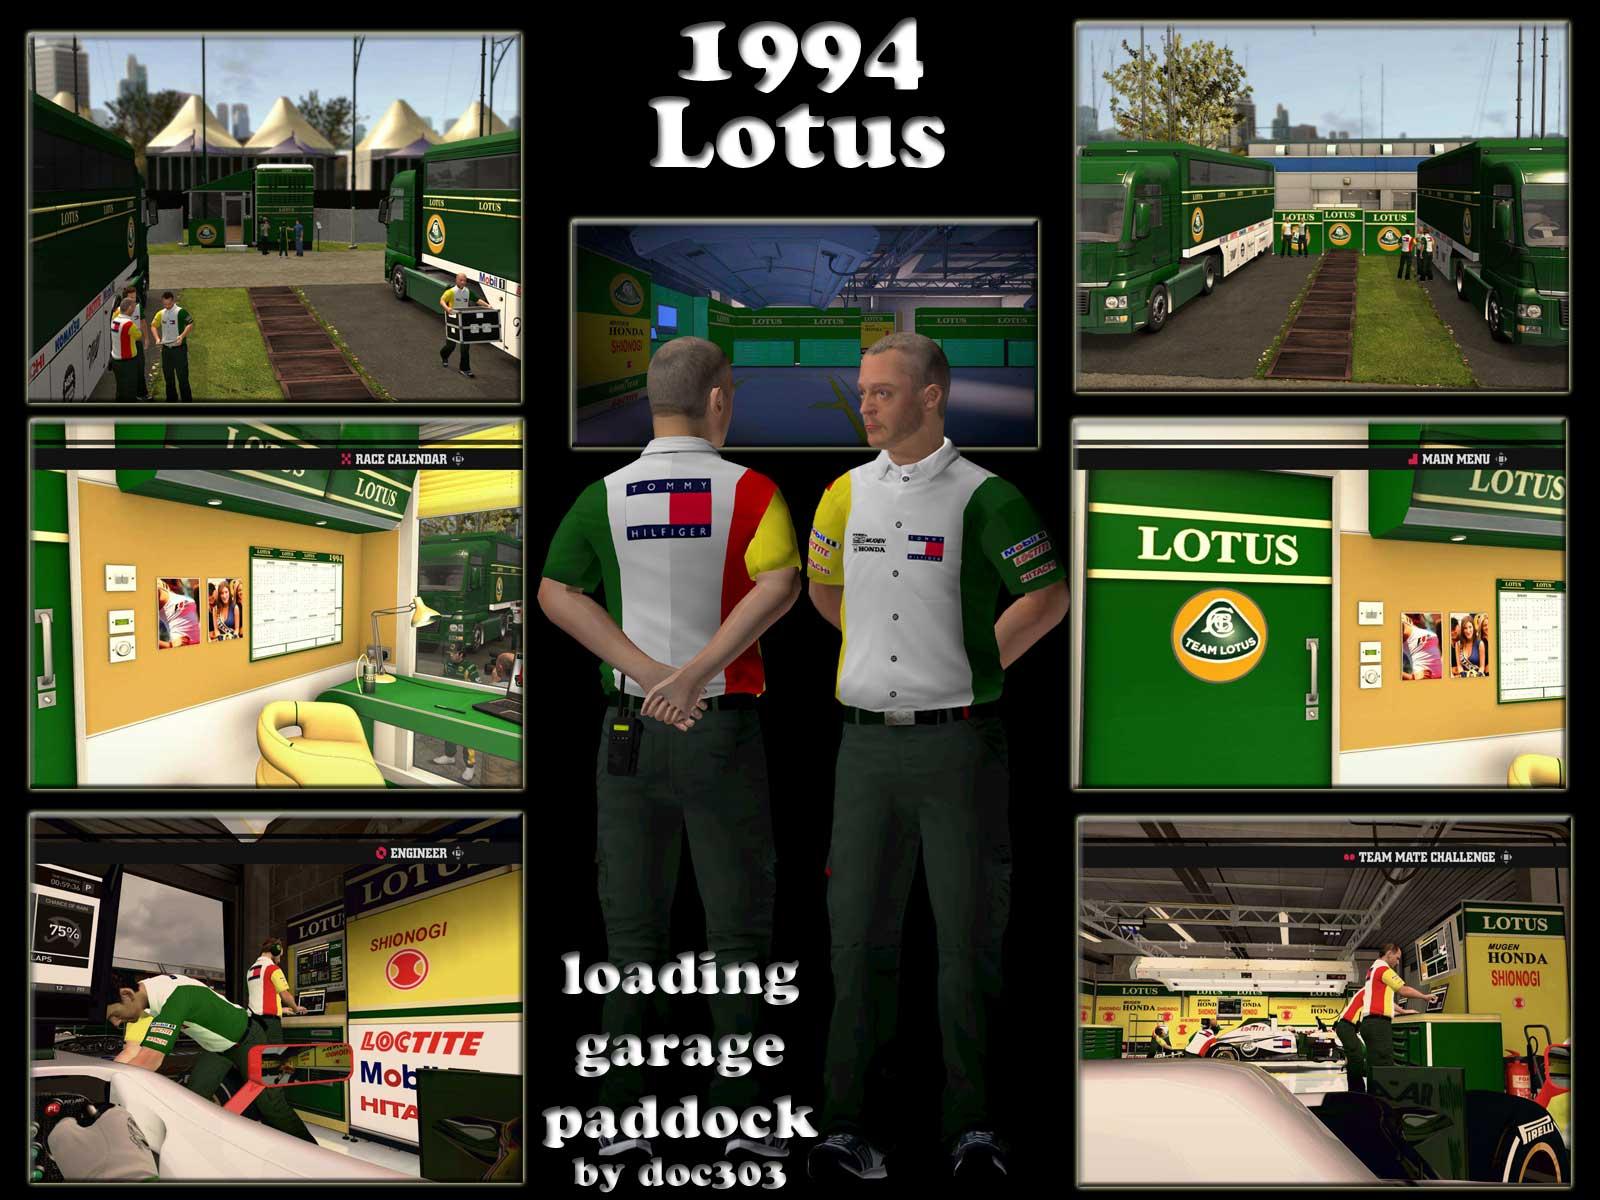 94-Lotus-Info.jpg